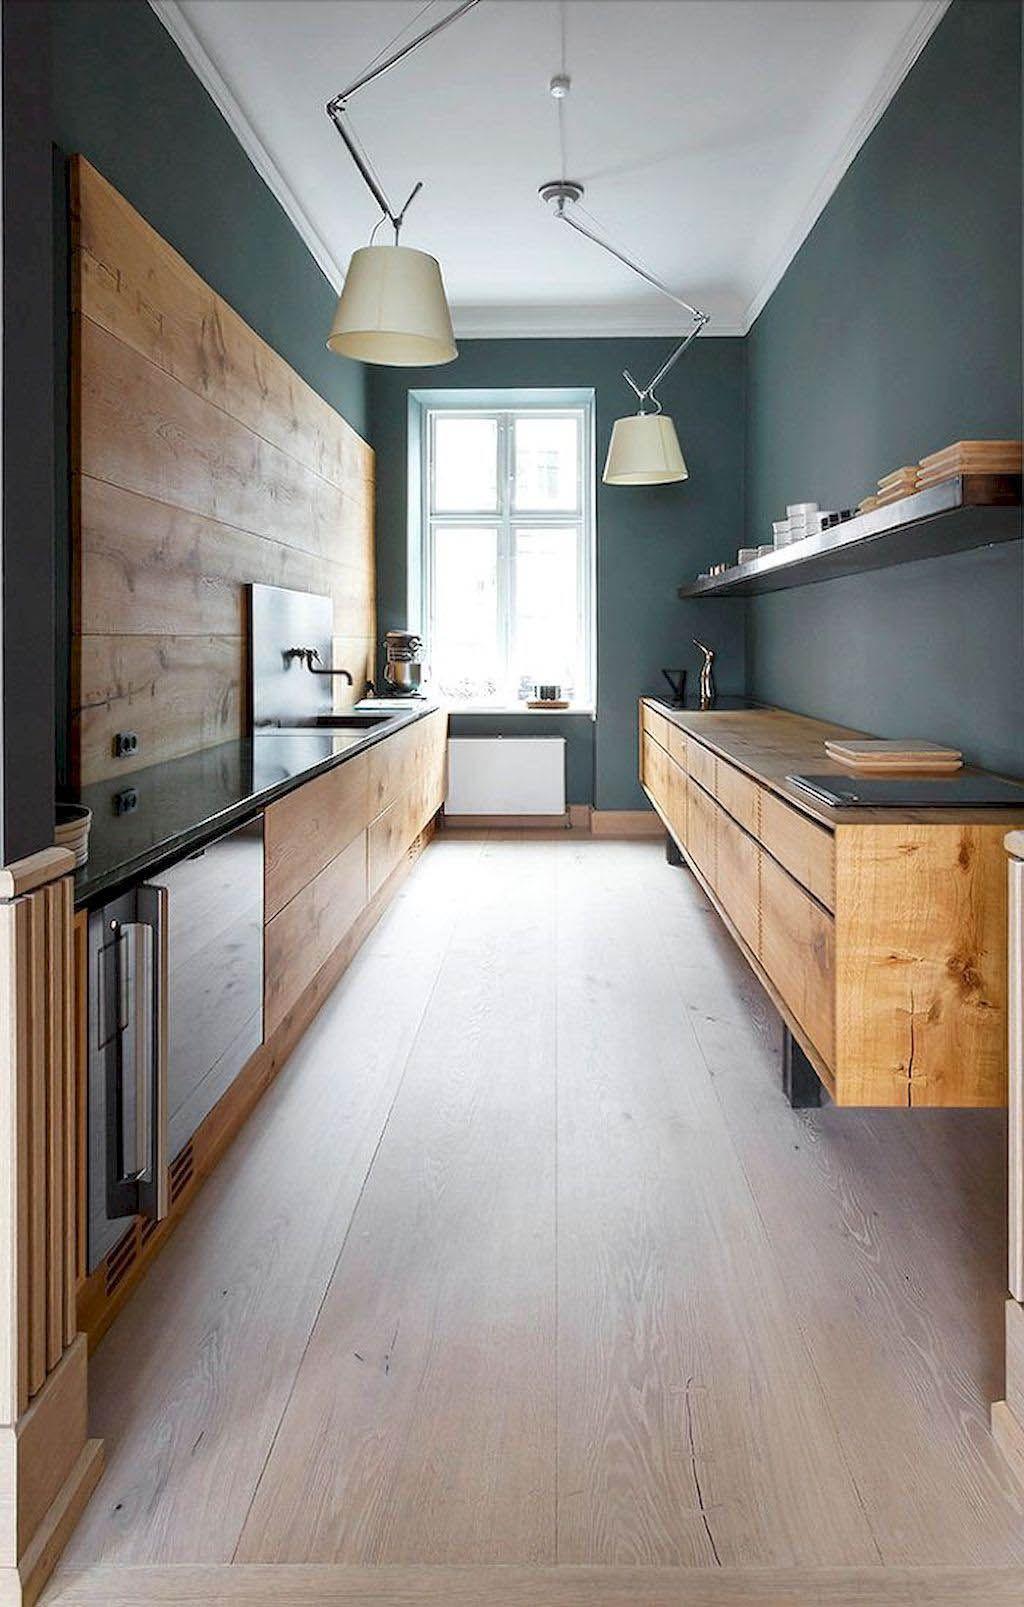 modern kitchen area style ideas galley kitchen design modern kitchen design small kitchen plans on kitchen remodel galley style id=80994